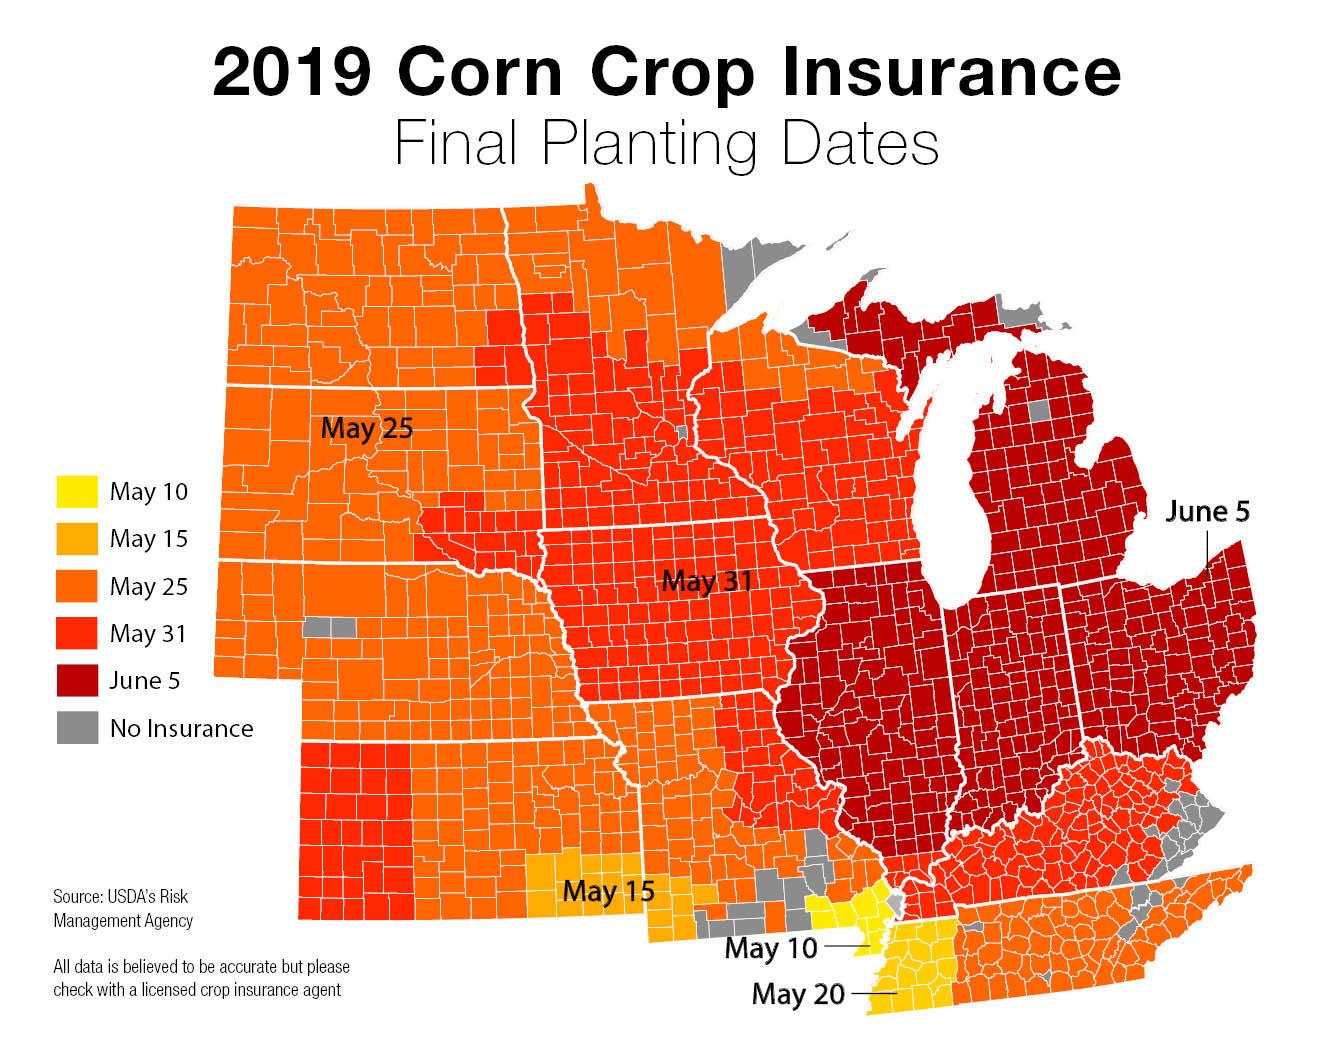 2019 Corn Final Planting Dates